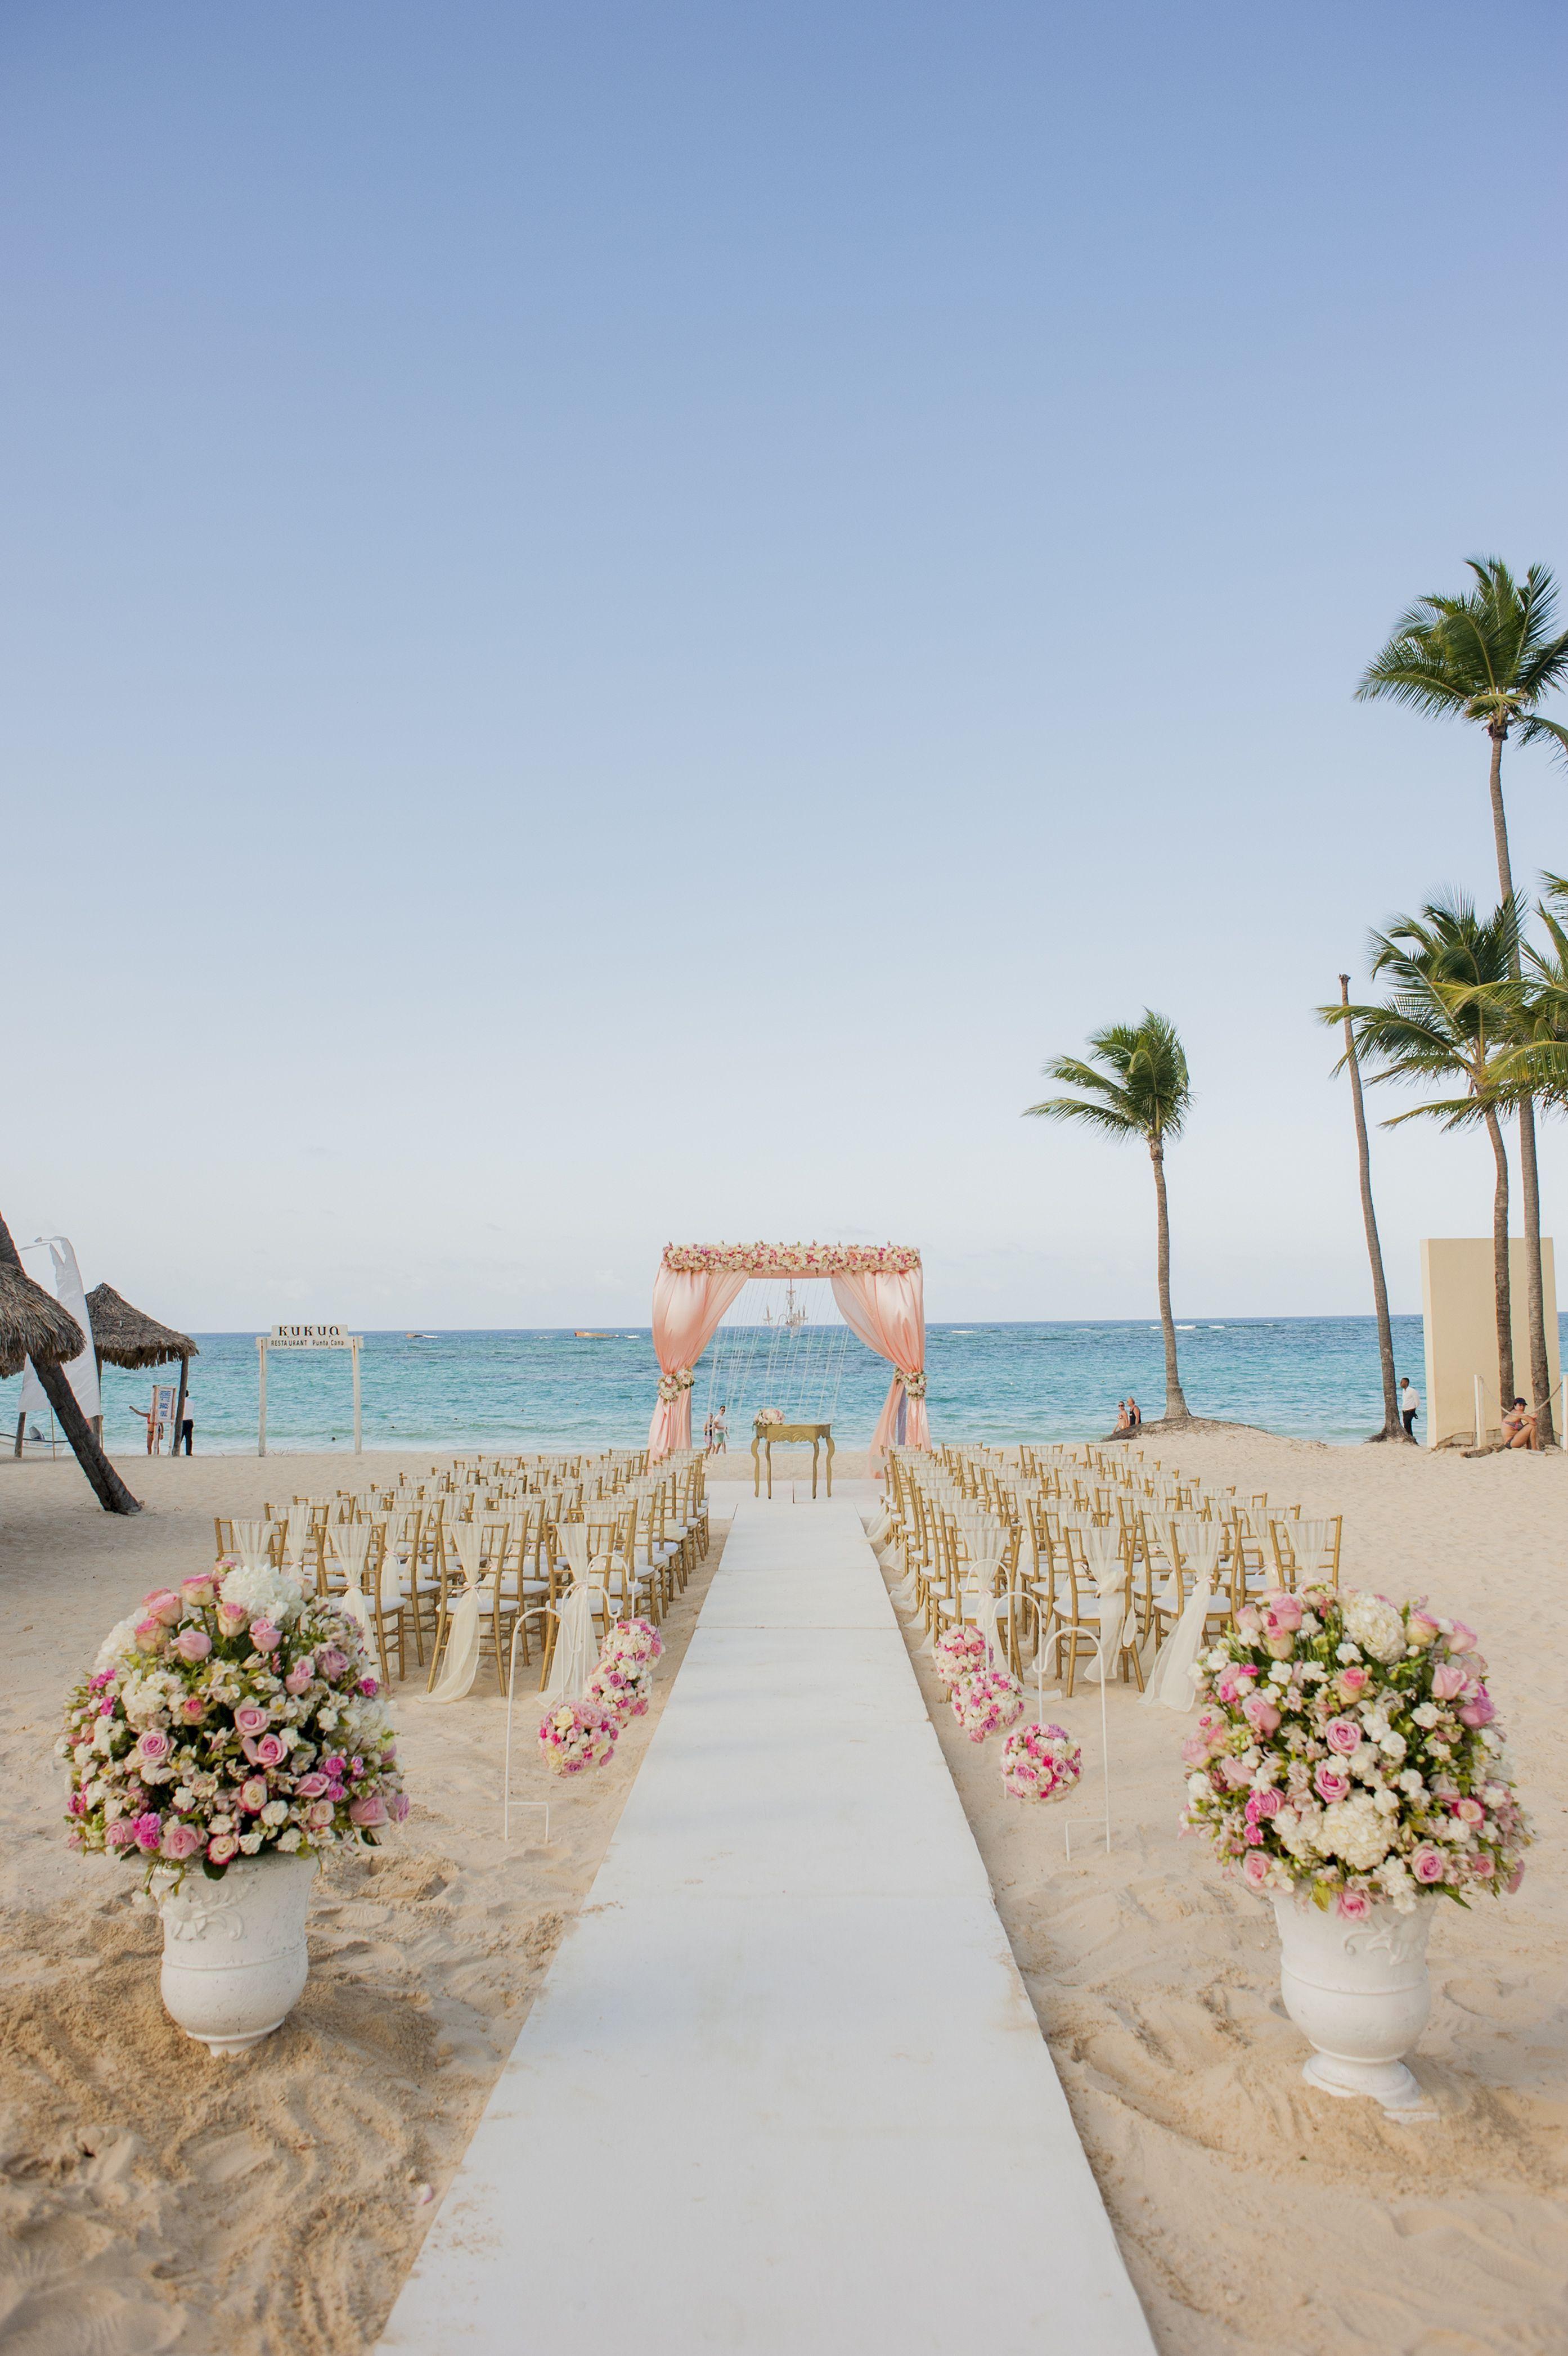 Pin On Wedding Themes Ideas